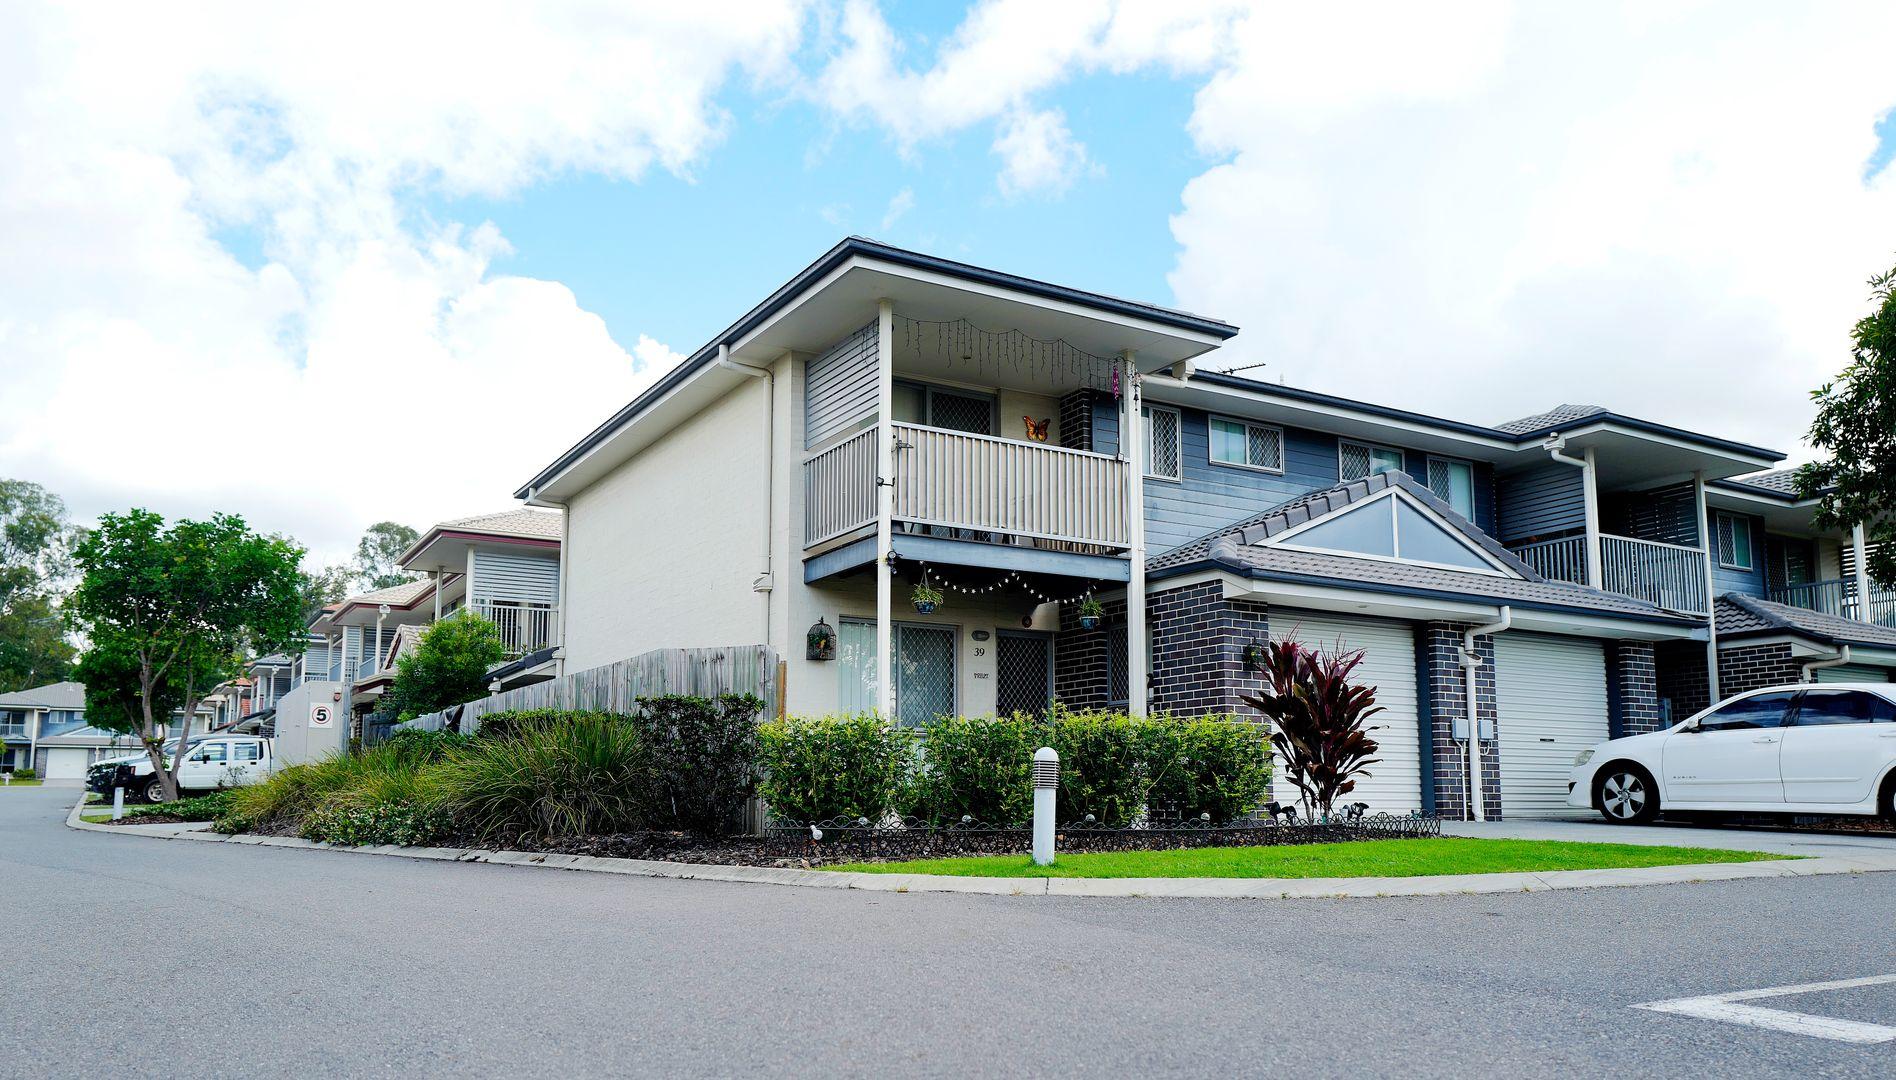 54/18a Wilga St, Wacol QLD 4076, Image 0